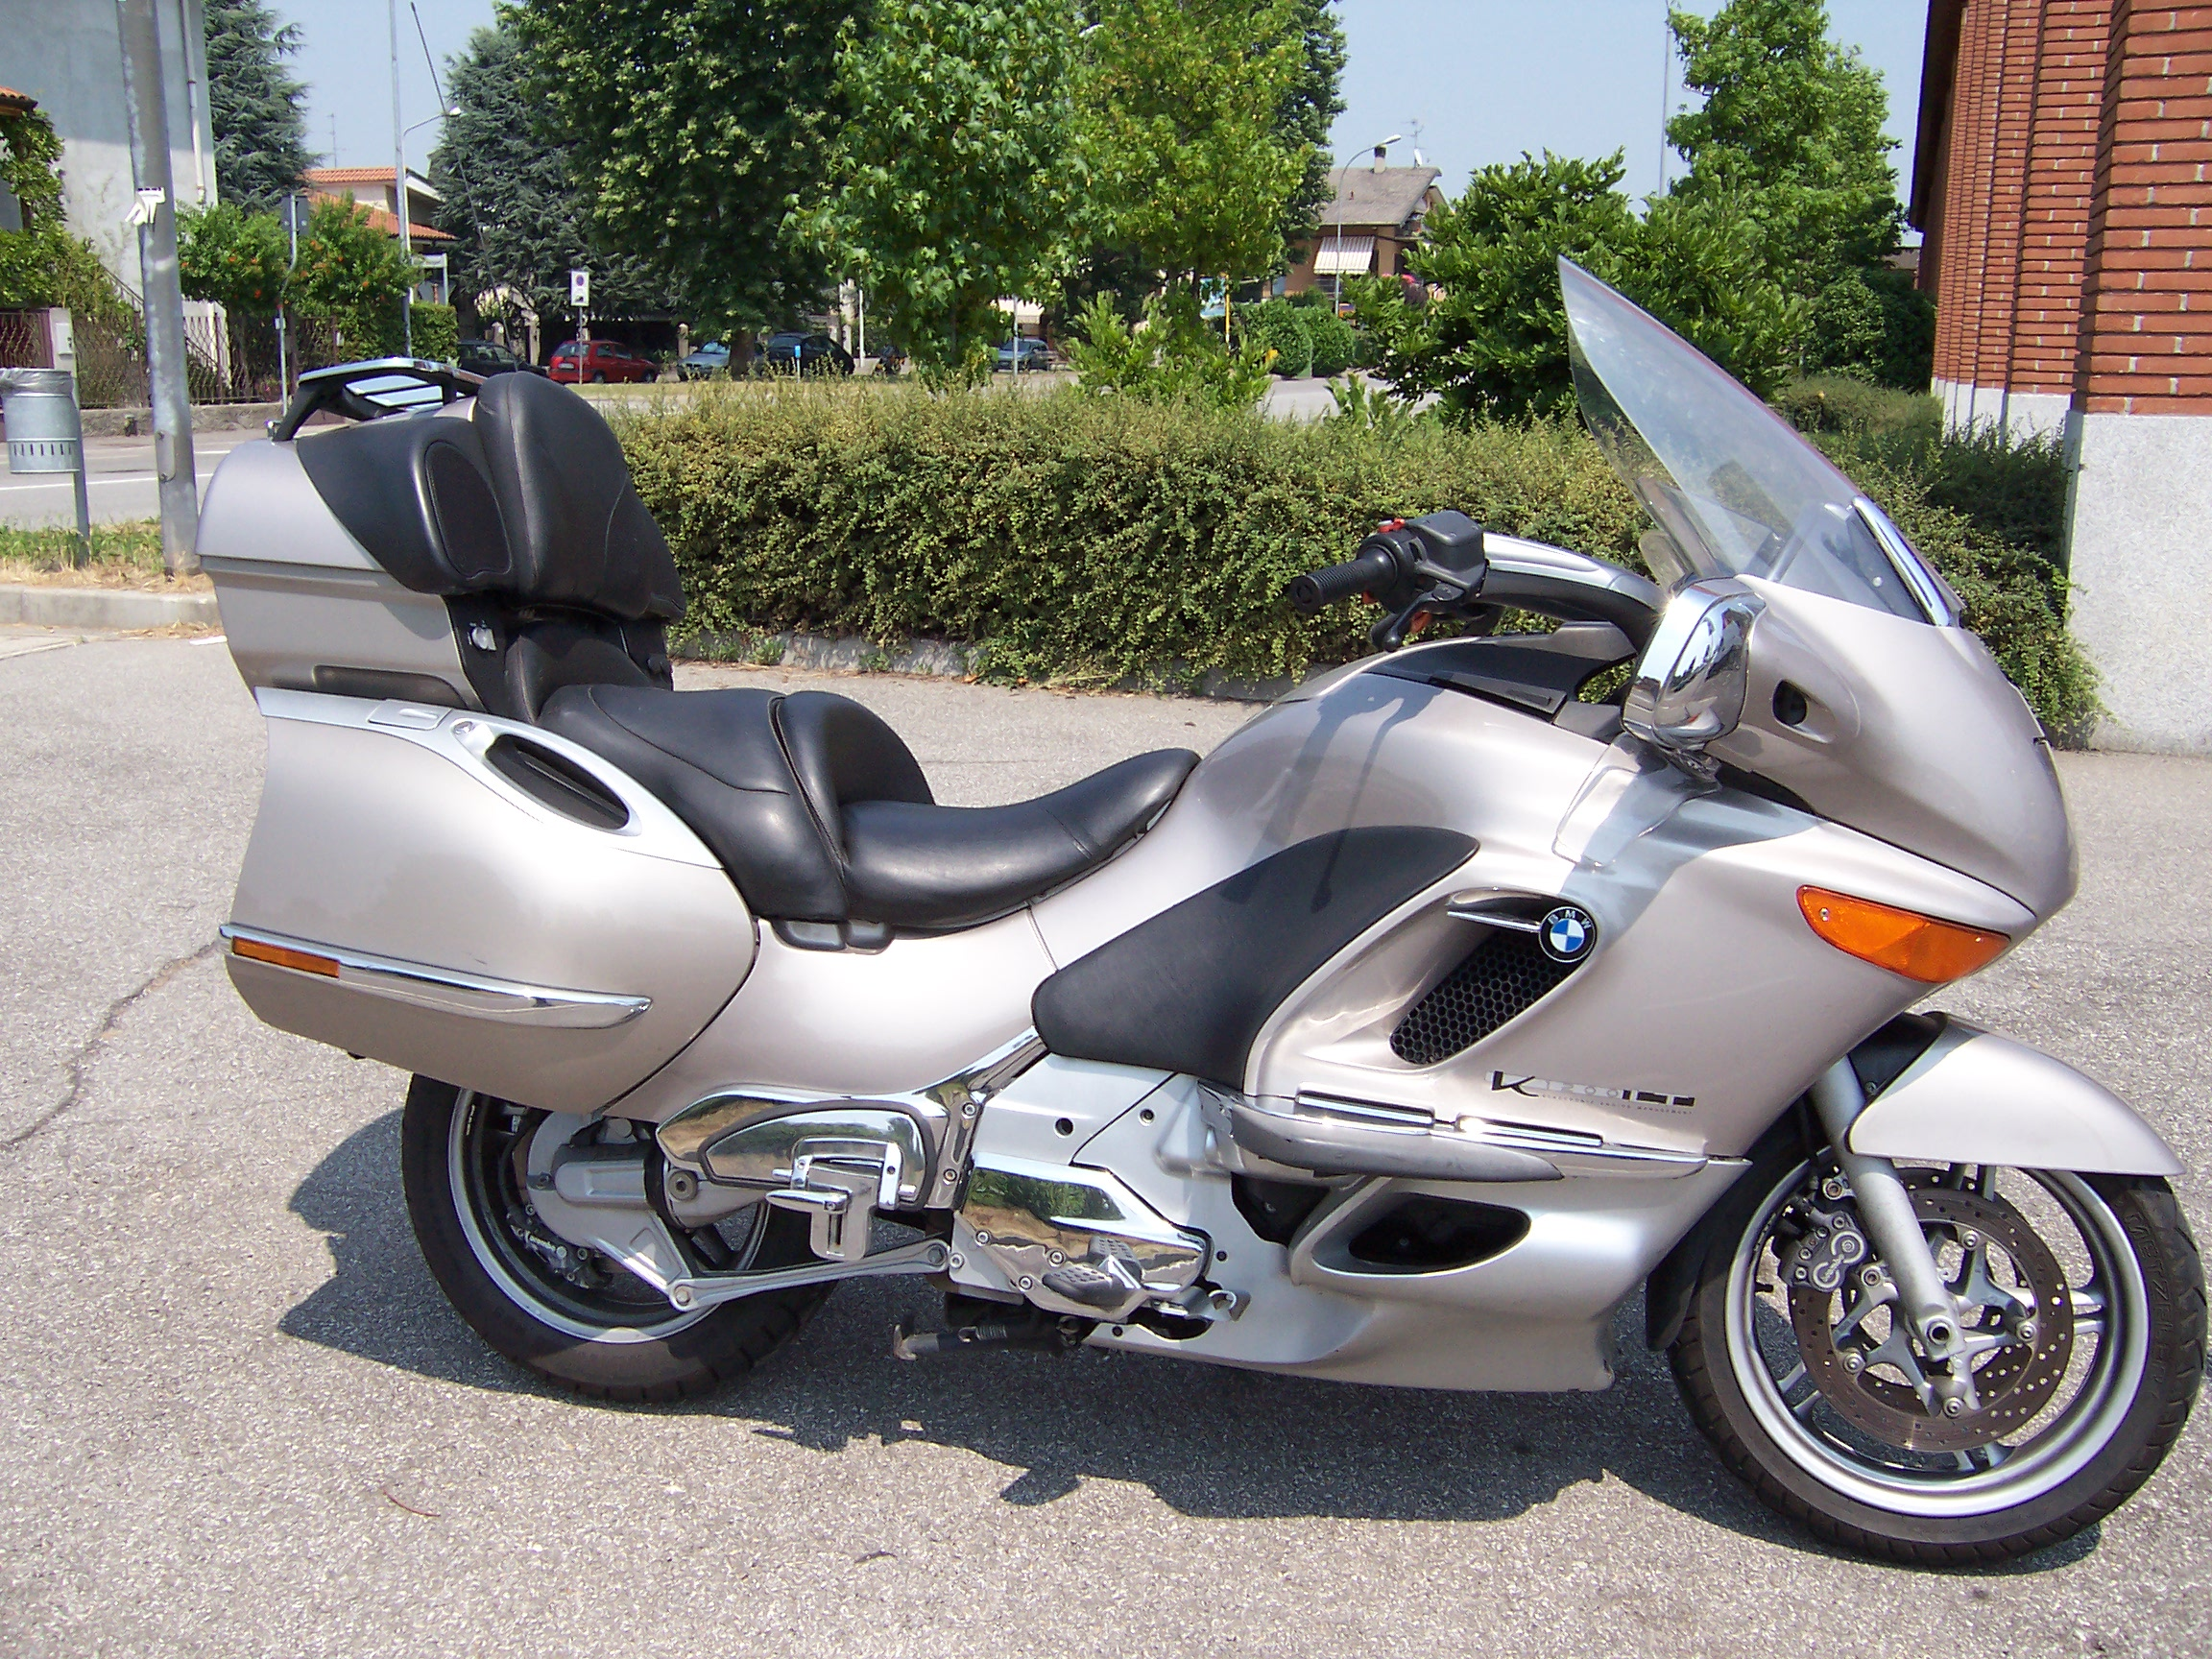 Vespa Motorcycle For Sale Uk